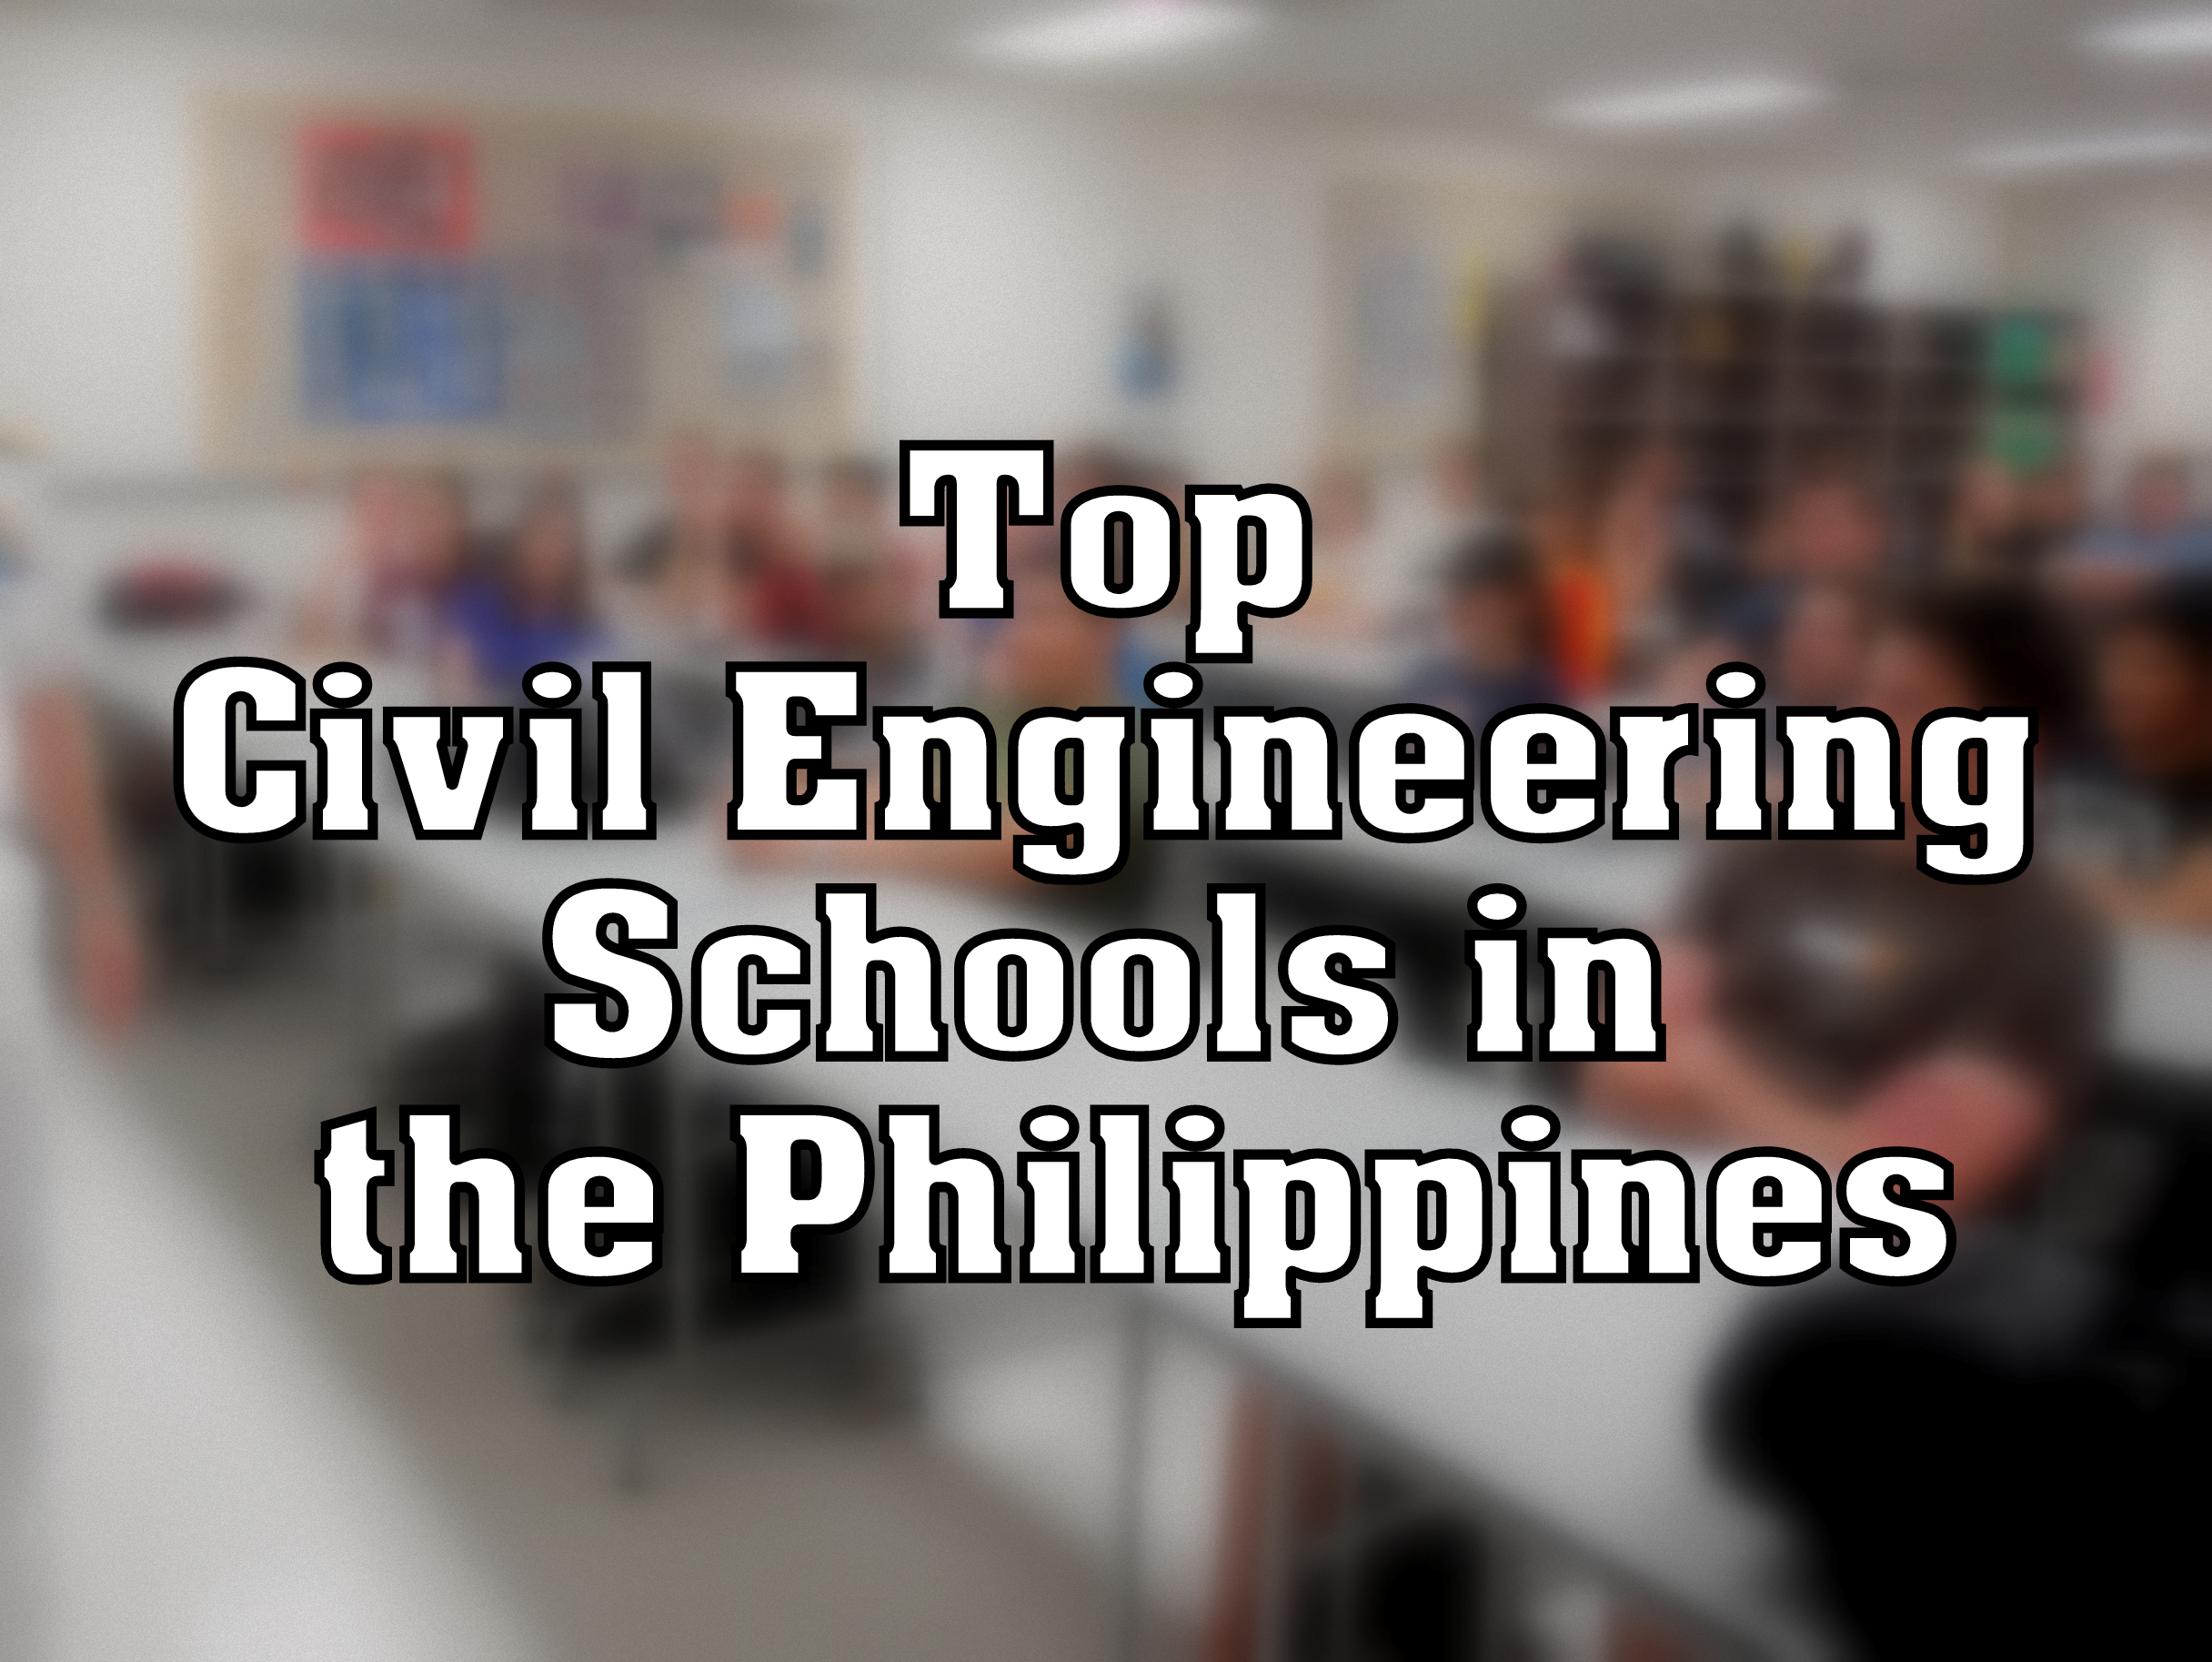 Top Civil Engineering Schools in the Philippines